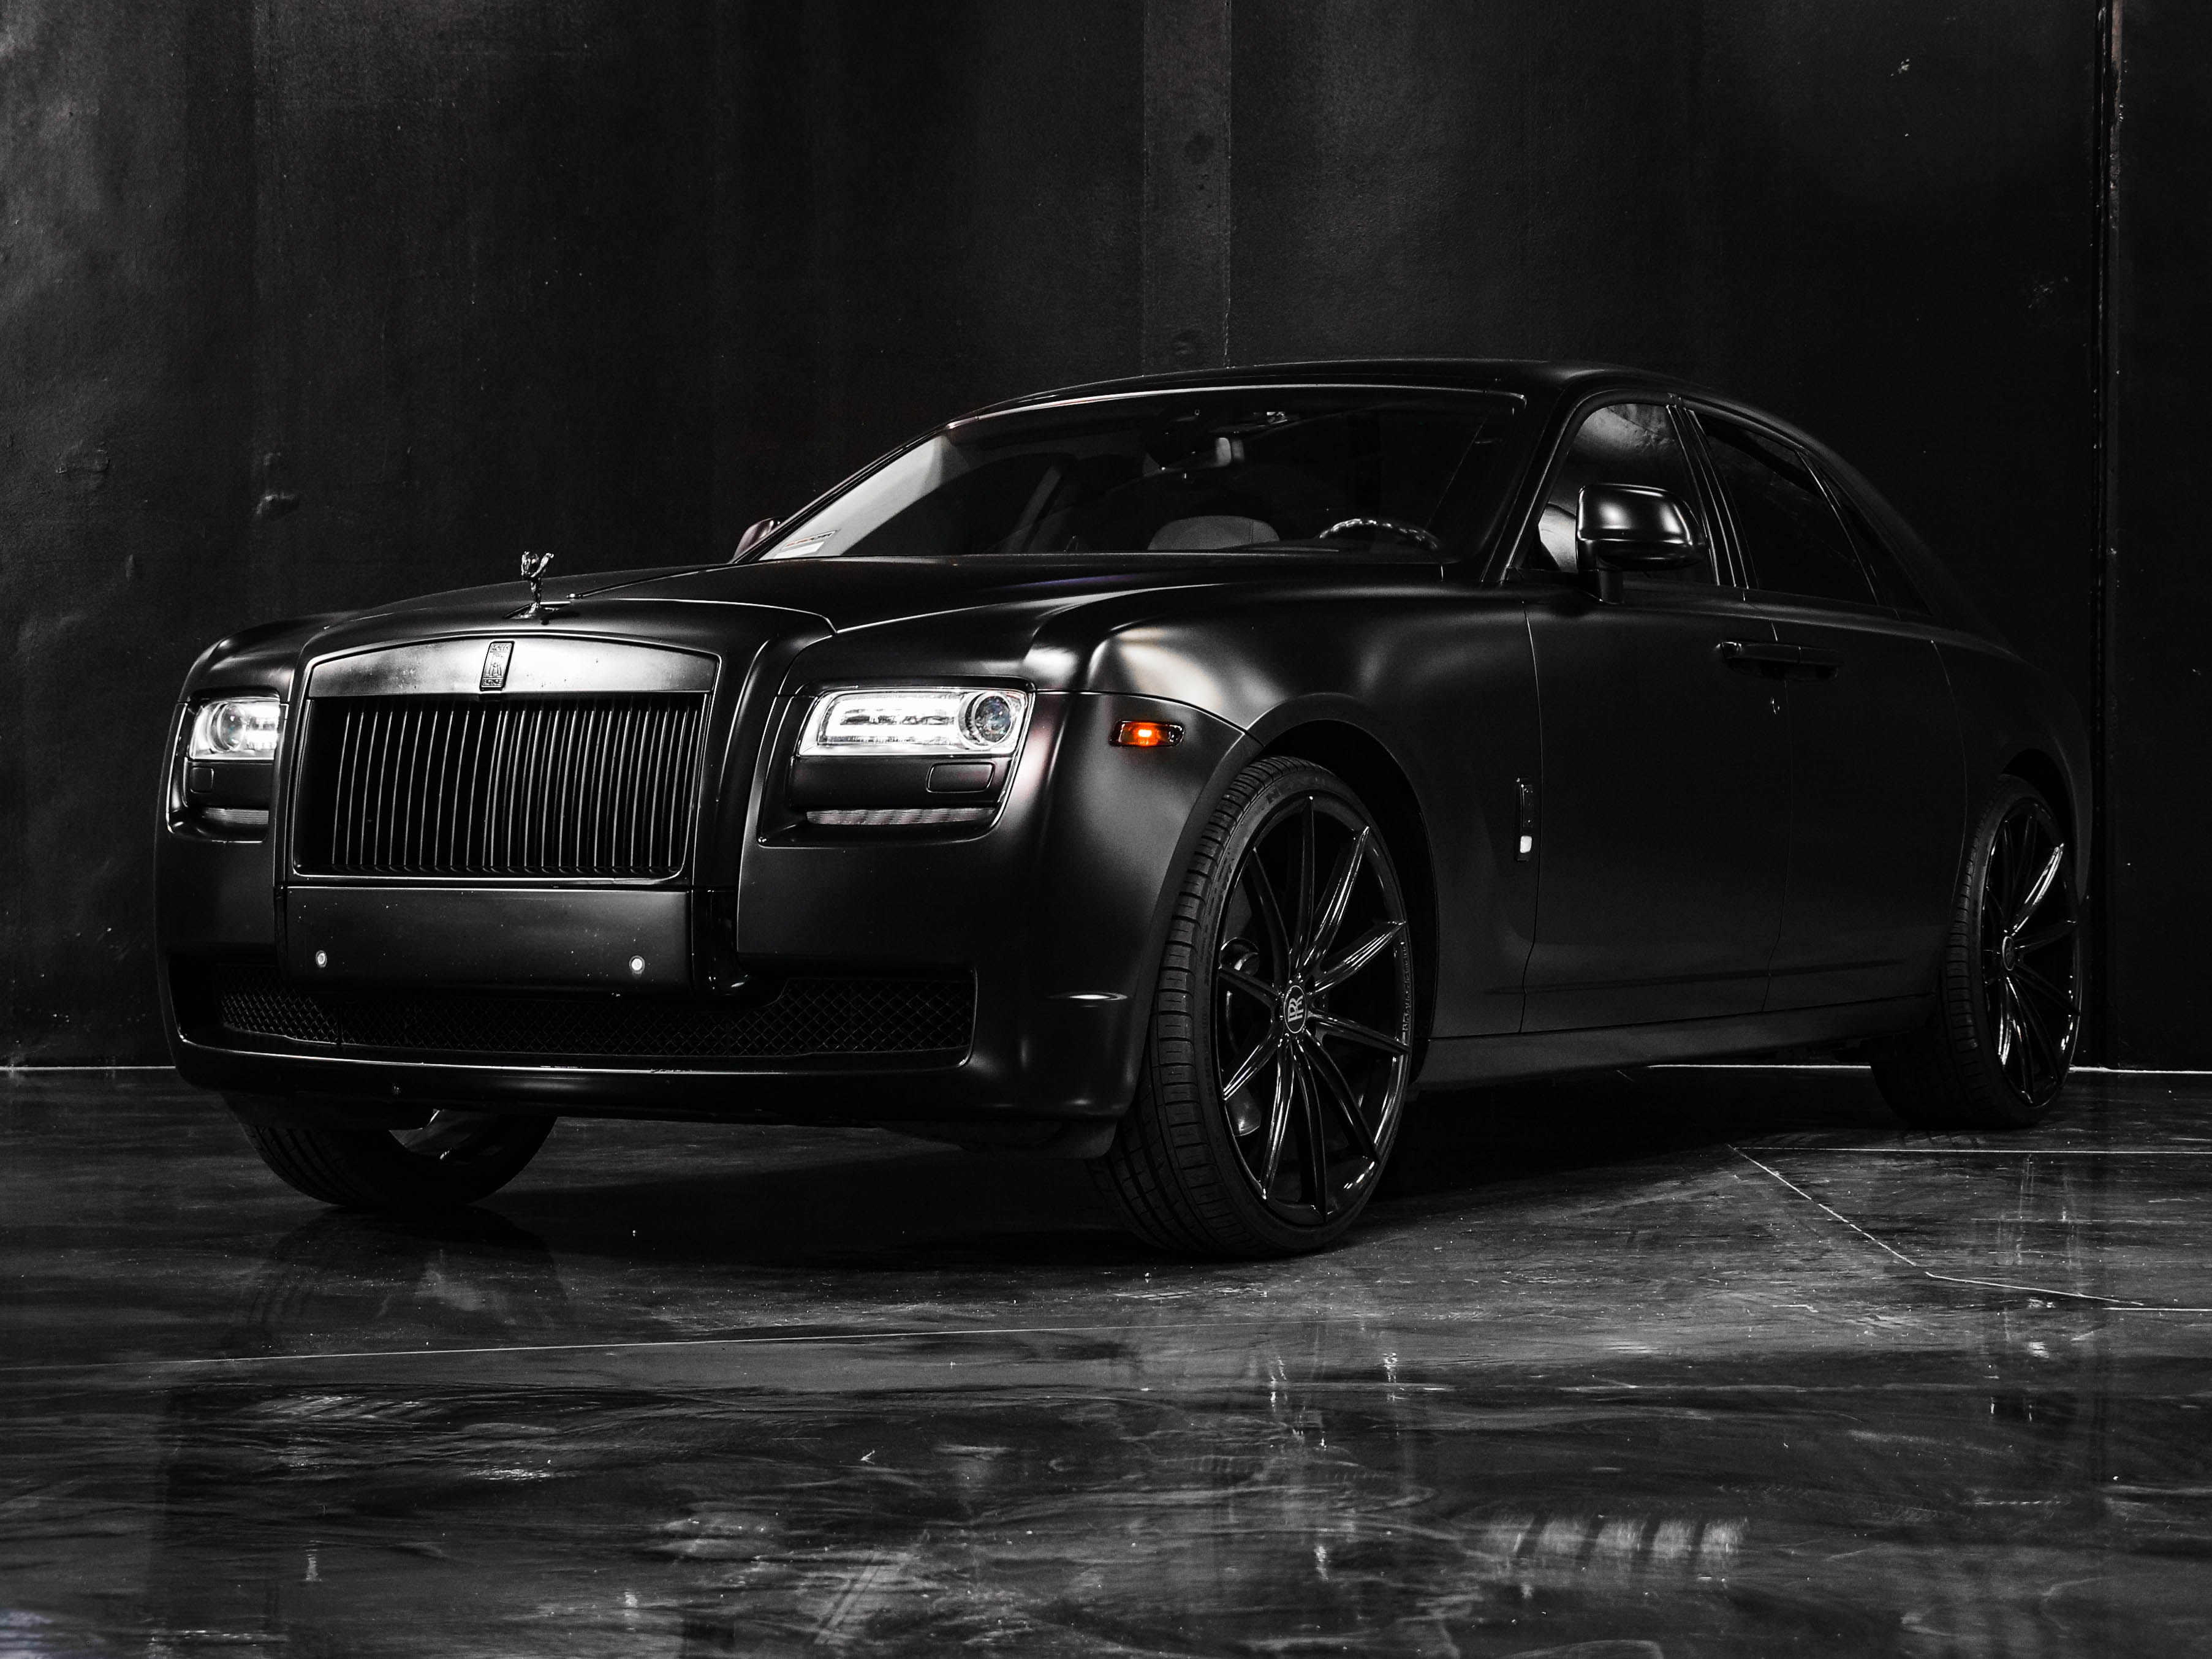 Luxury Matte Black Car Free Stock Photo